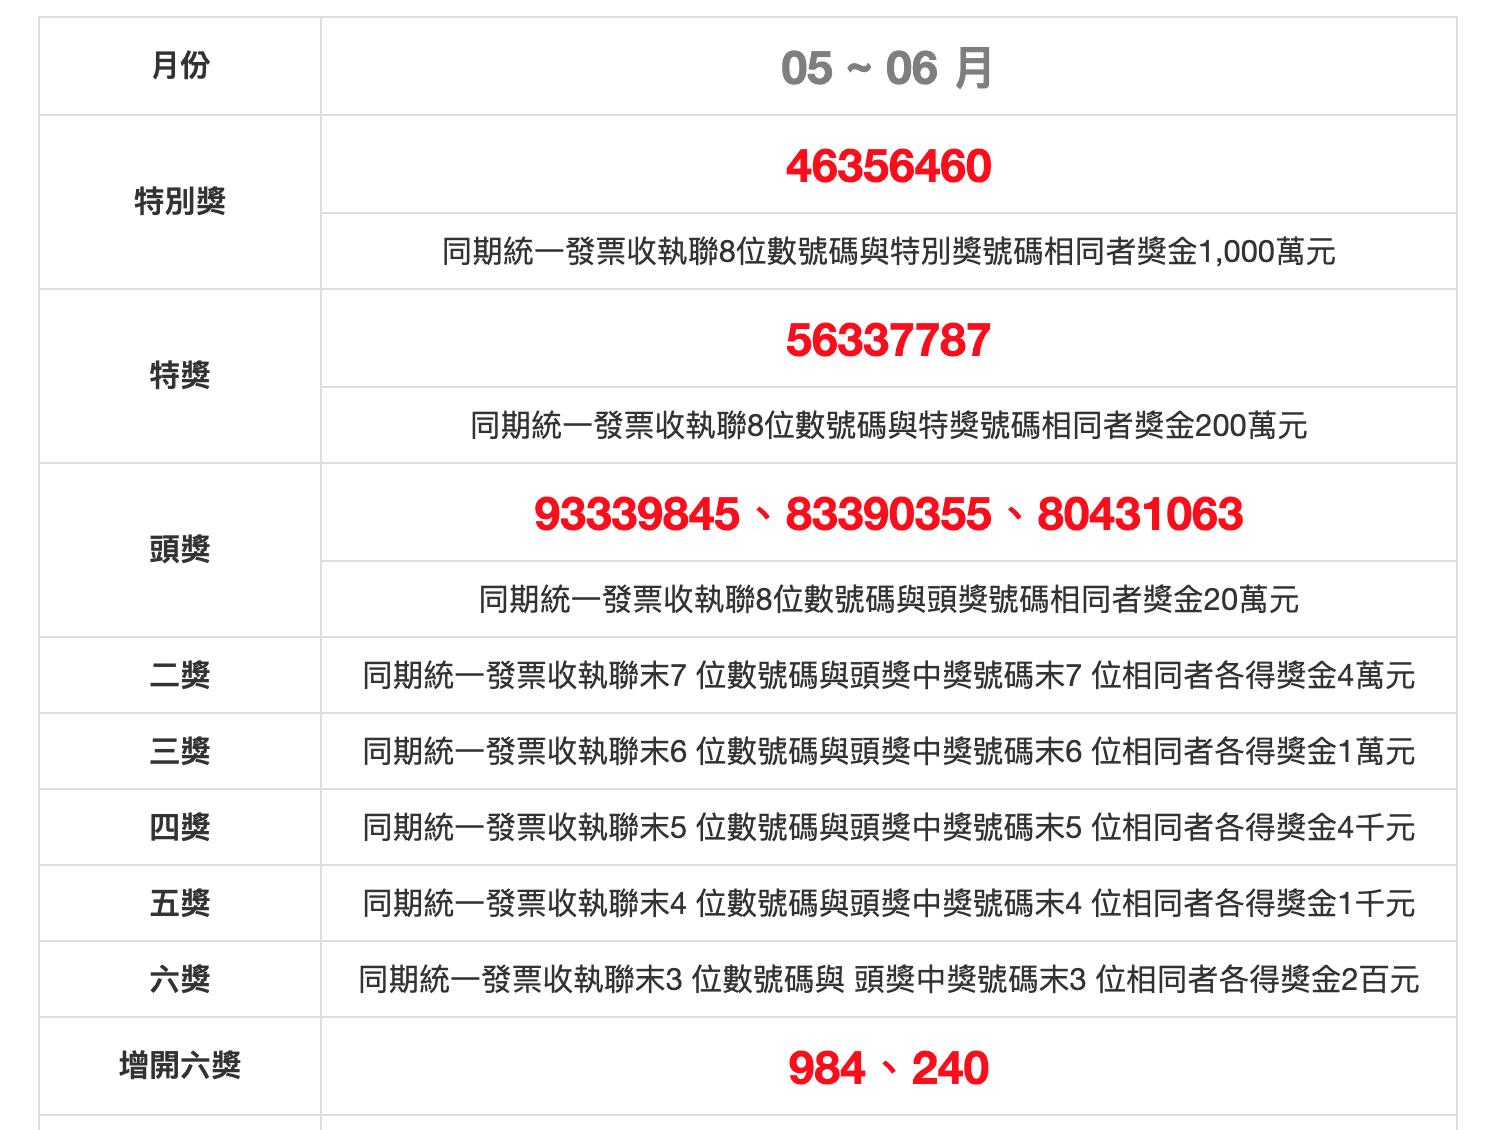 Uniform invoice winning numbers ROC May June 2019 108年5、6月統一發票號碼獎中獎號碼 2019